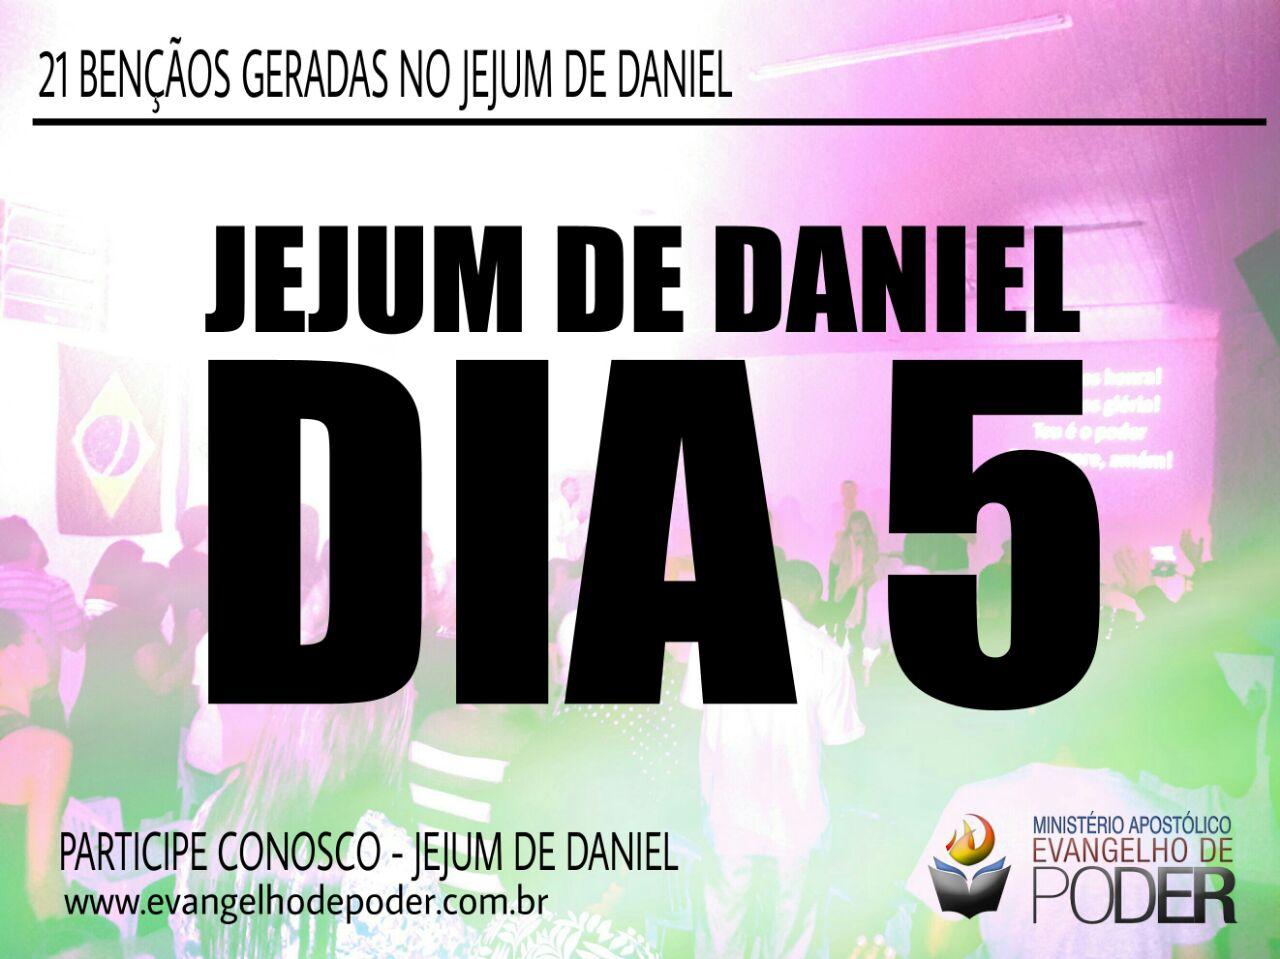 JEJUM DE DANIEL 5° DIA